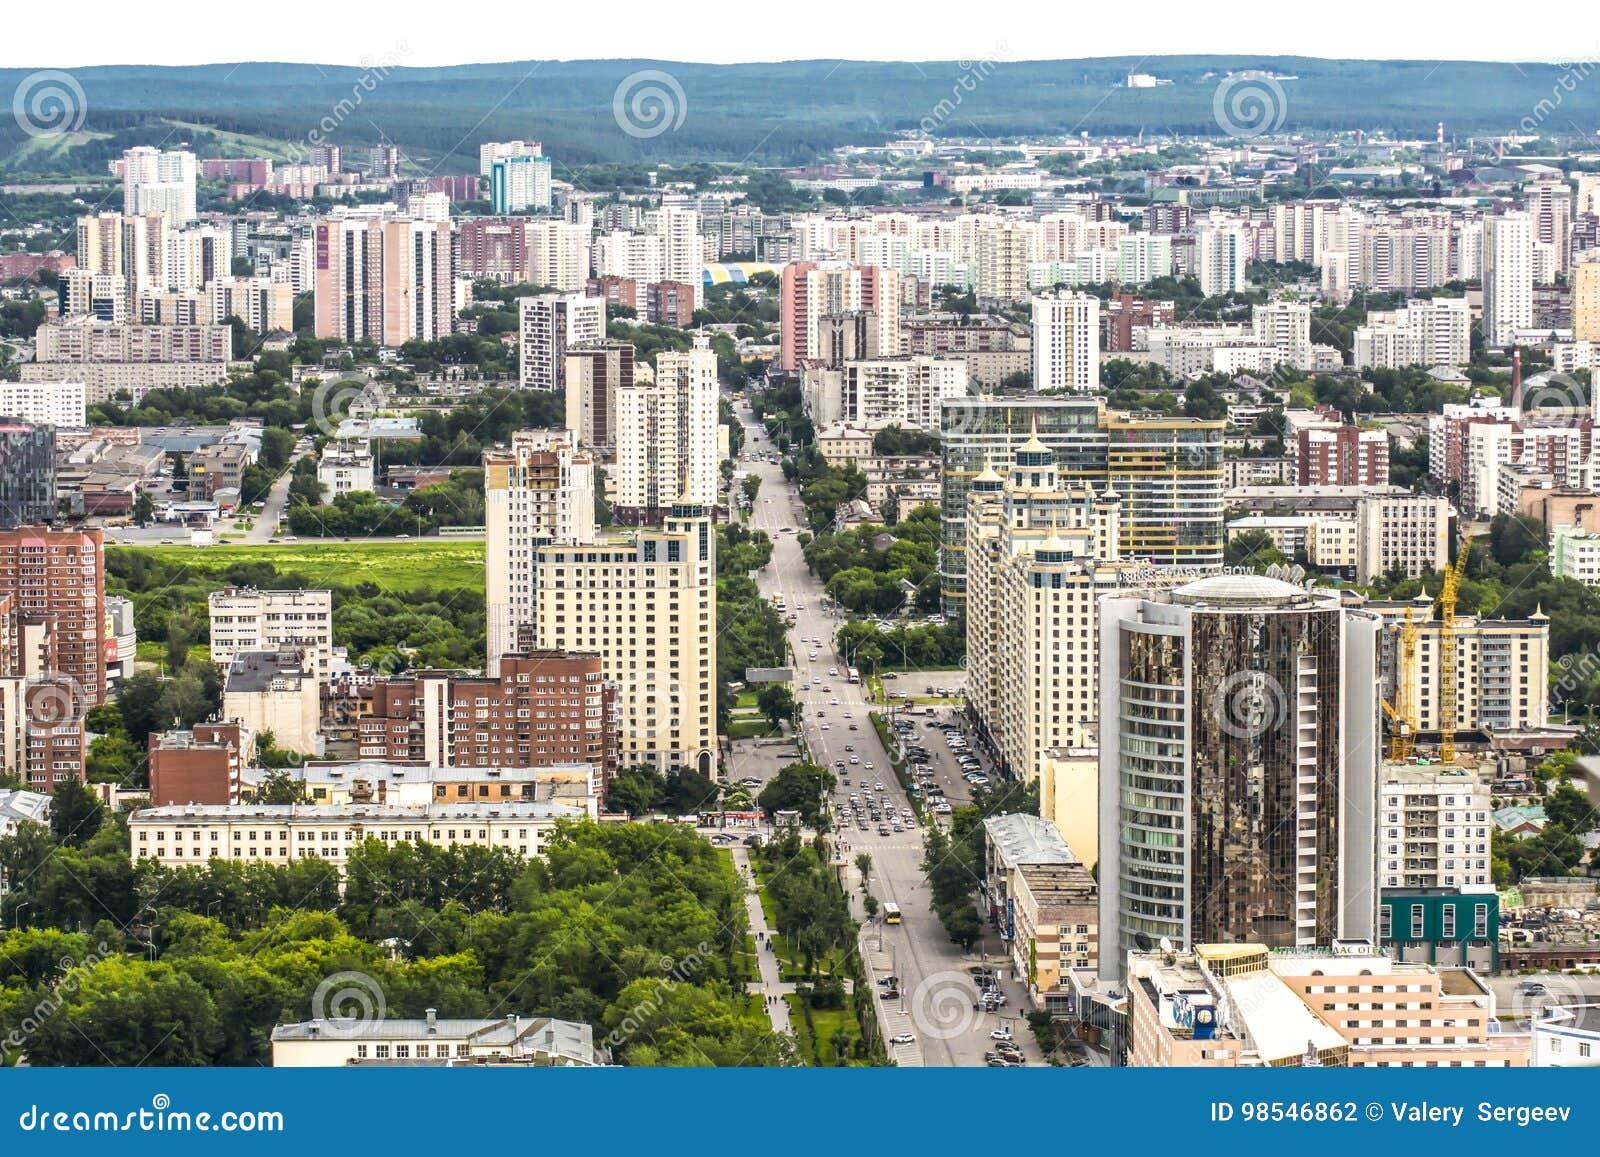 Ryssland Ekaterinburg Gatasikter av Belinsky och den sydliga delen av staden